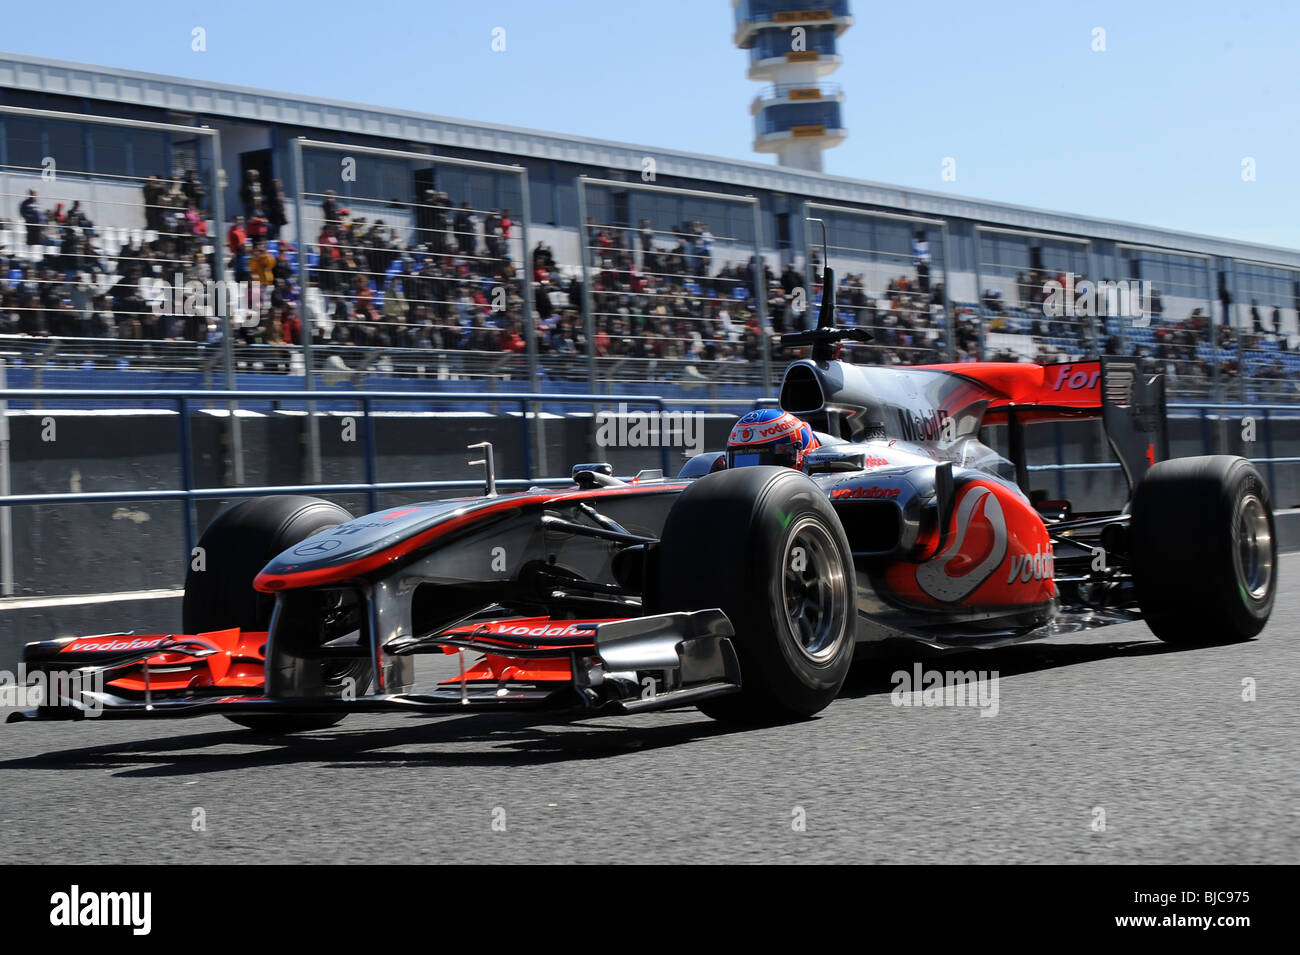 F1 formula 1 mclaren jenson button - Stock Image